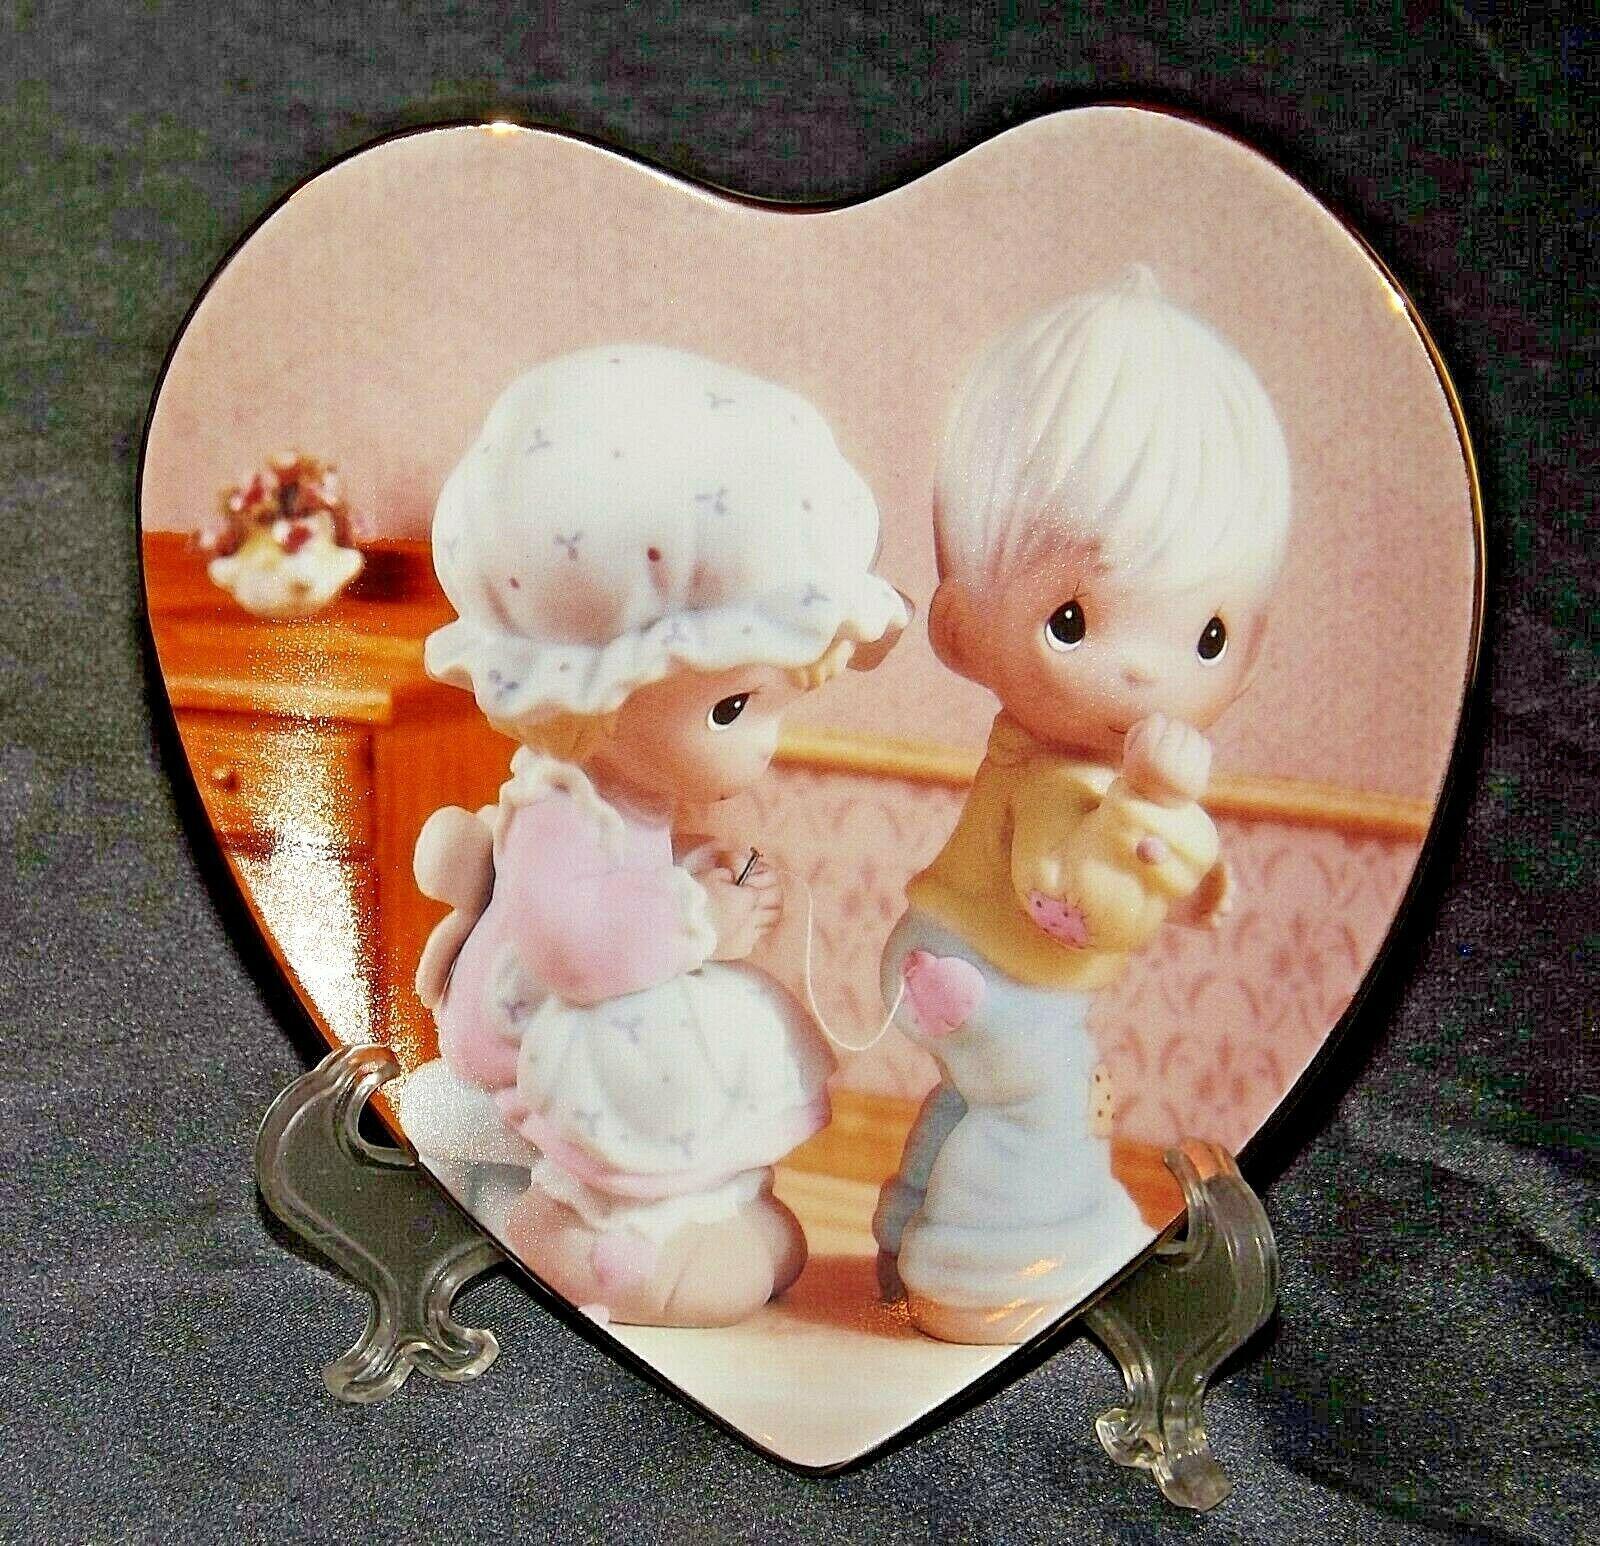 """Sew In Love"" Precious Moments - The Hamilton Collection by Sam Butcher AA20-CP2"